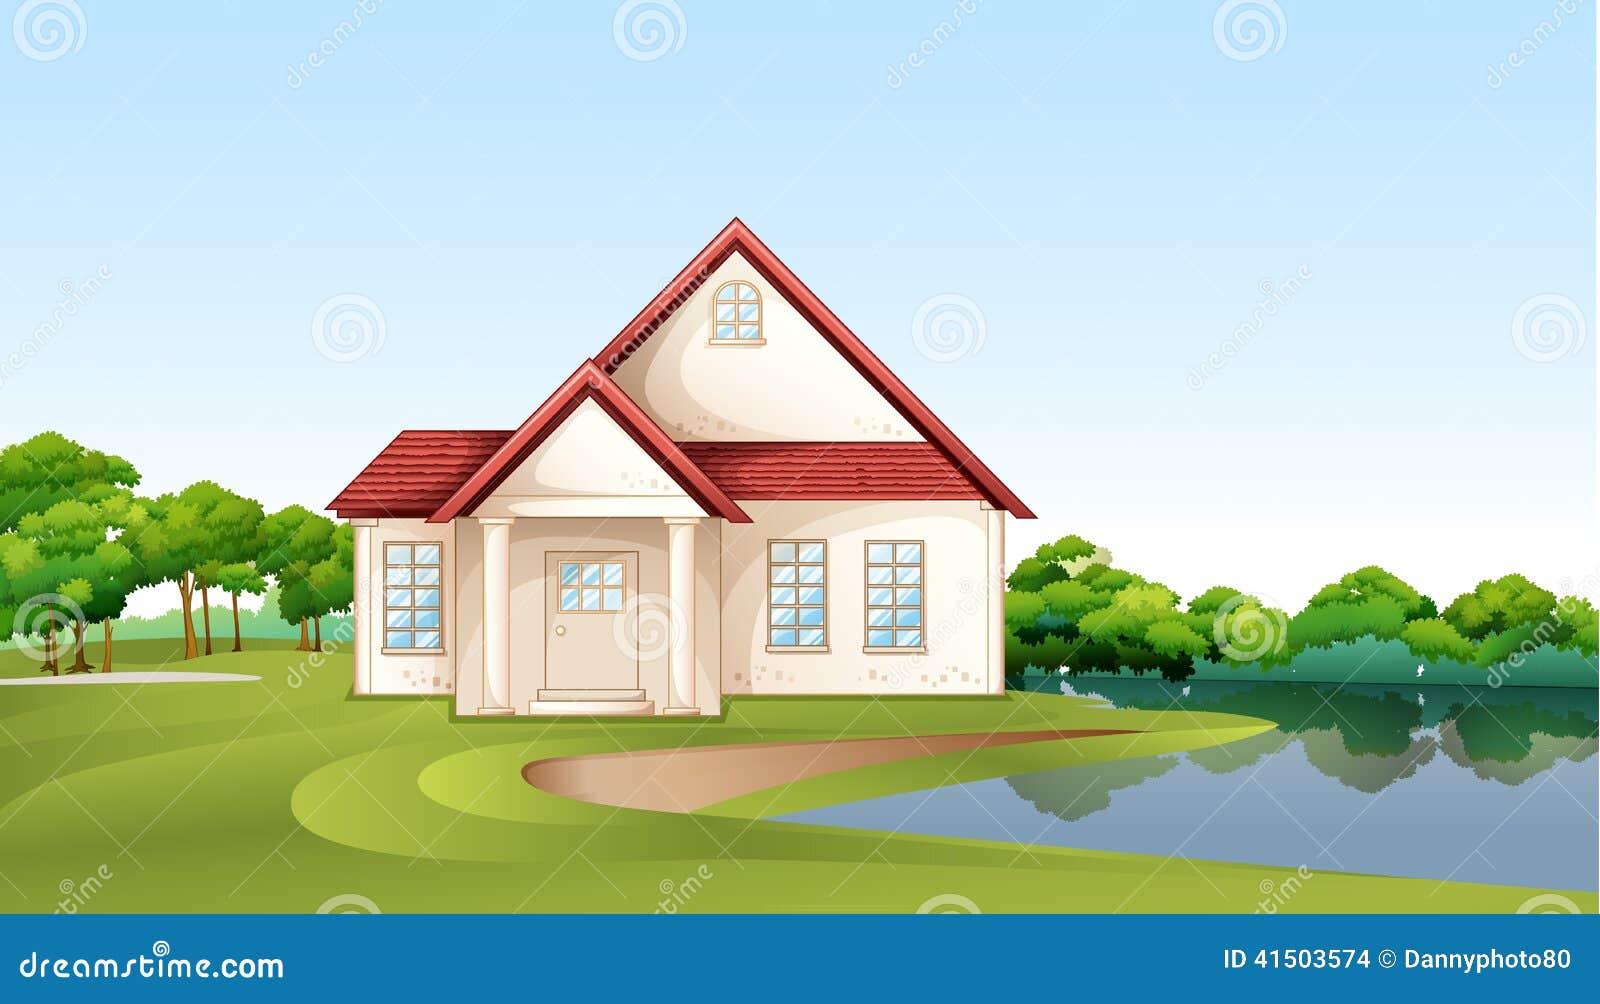 A Big Concrete House Near The River Stock Vector Image